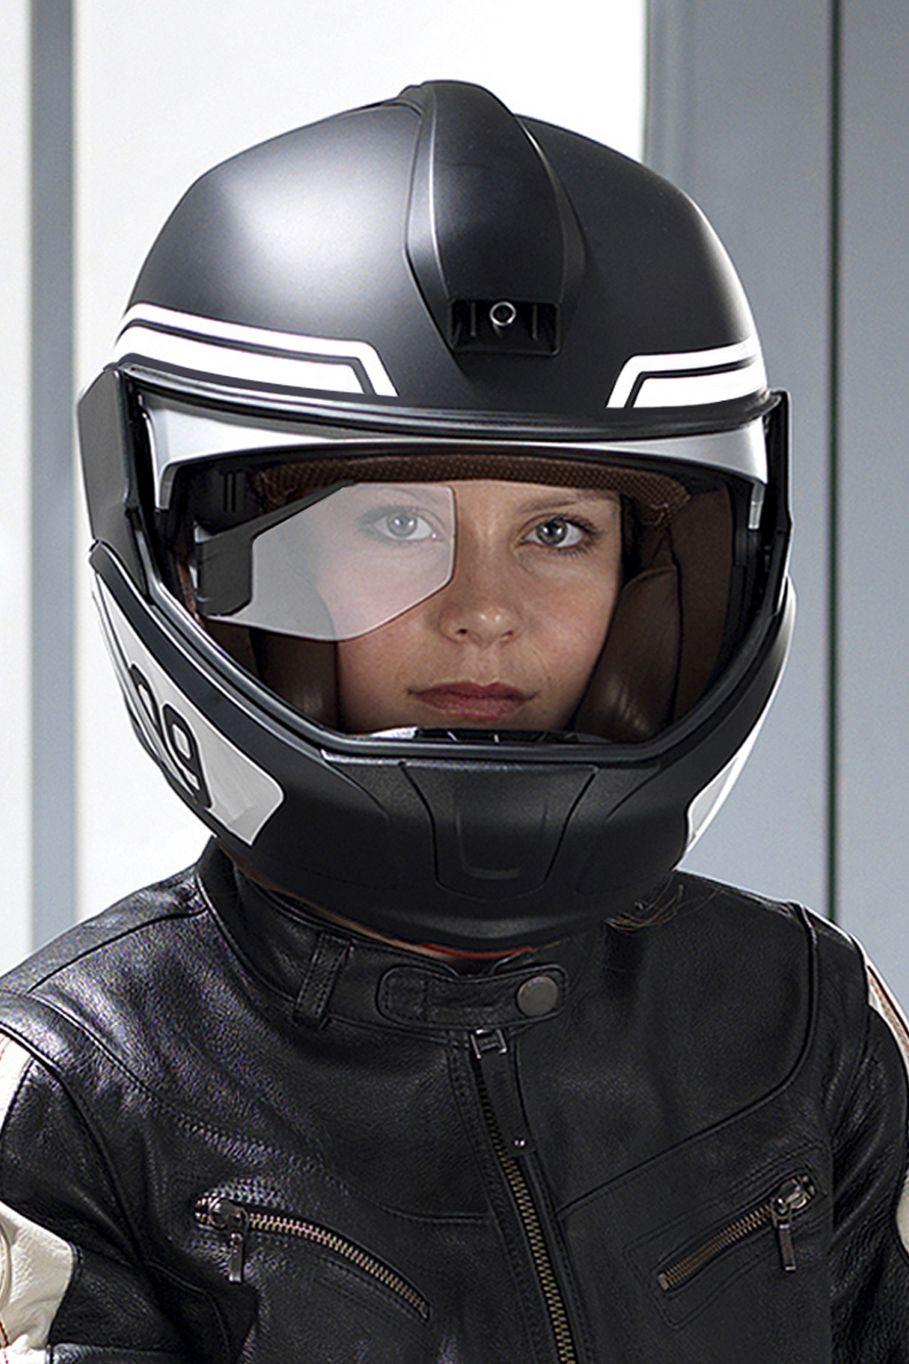 BMW developing HUD helmet